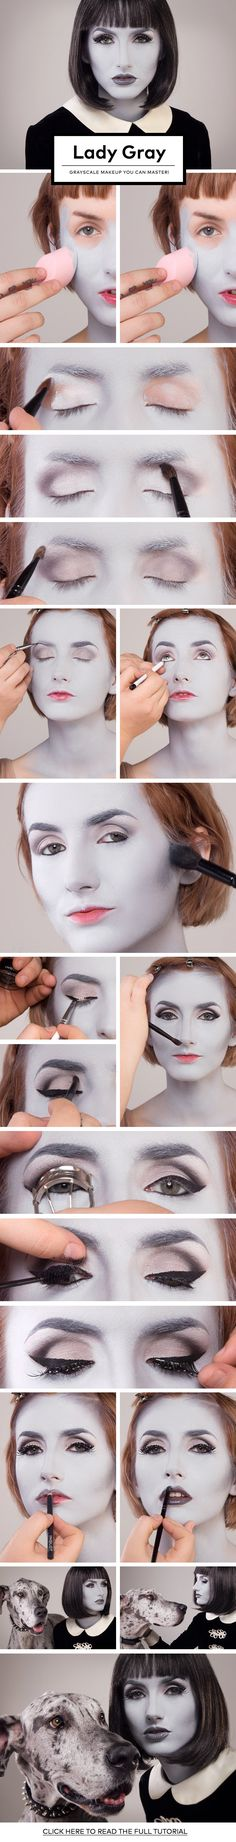 Grayscale Makeup